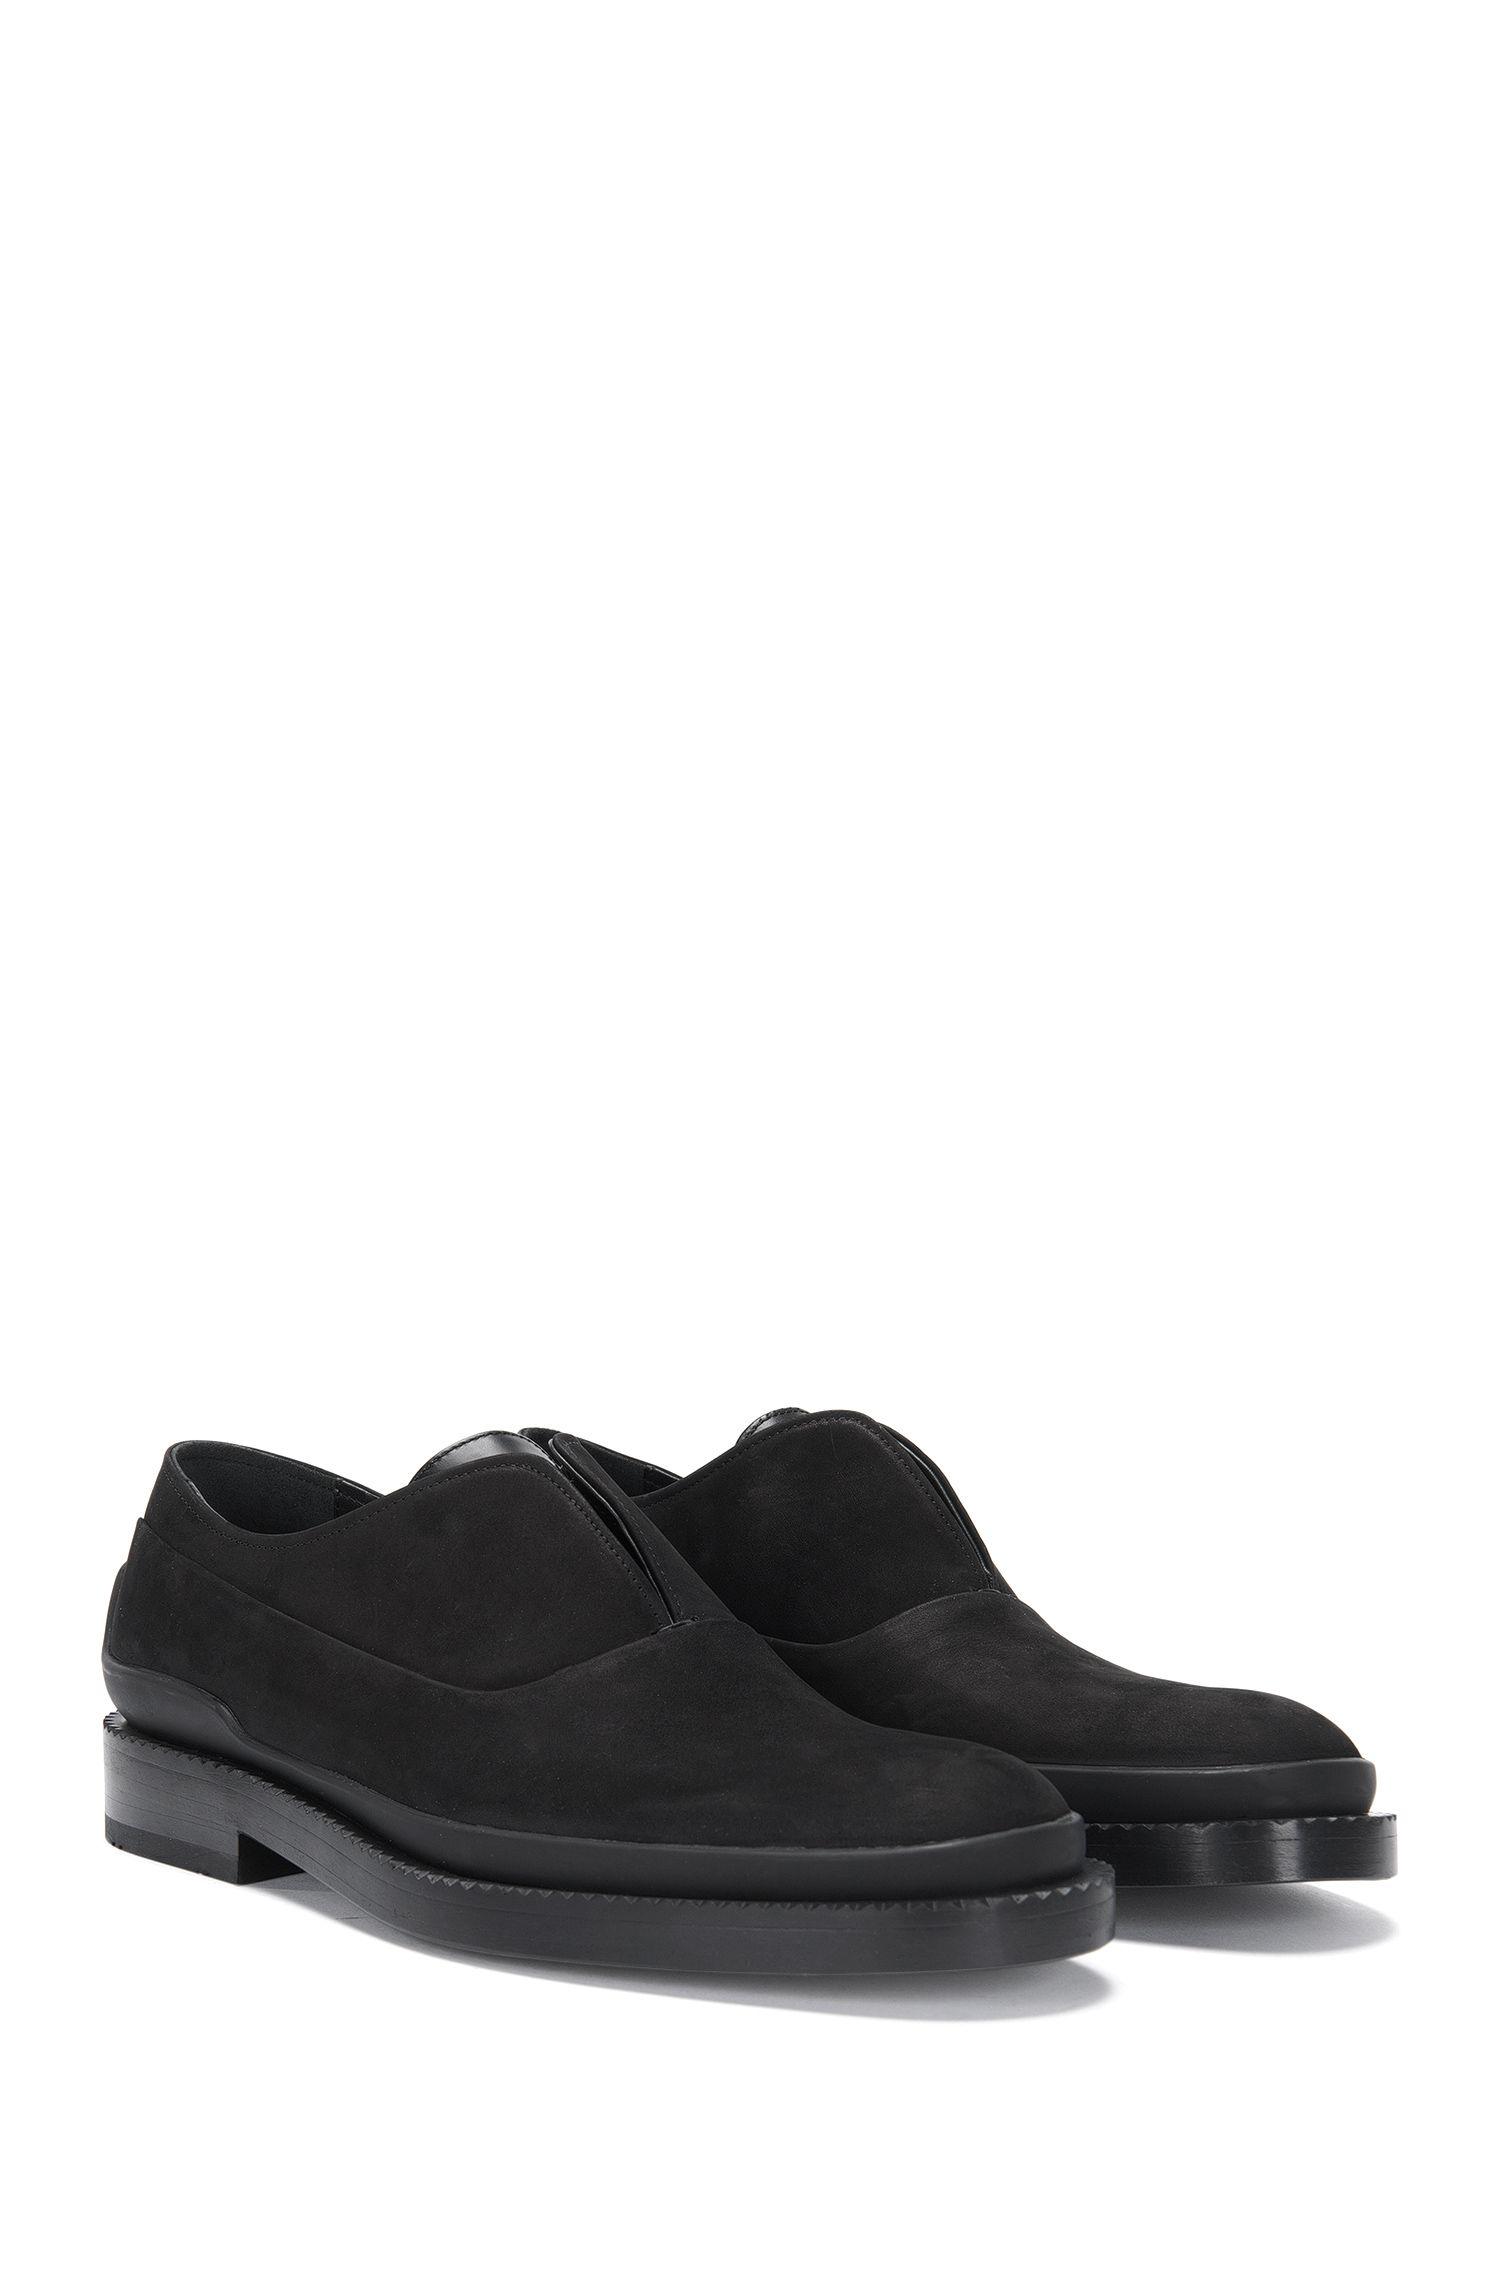 'Mono Oxfr Nu' | Nubuck Calfskin Loafers